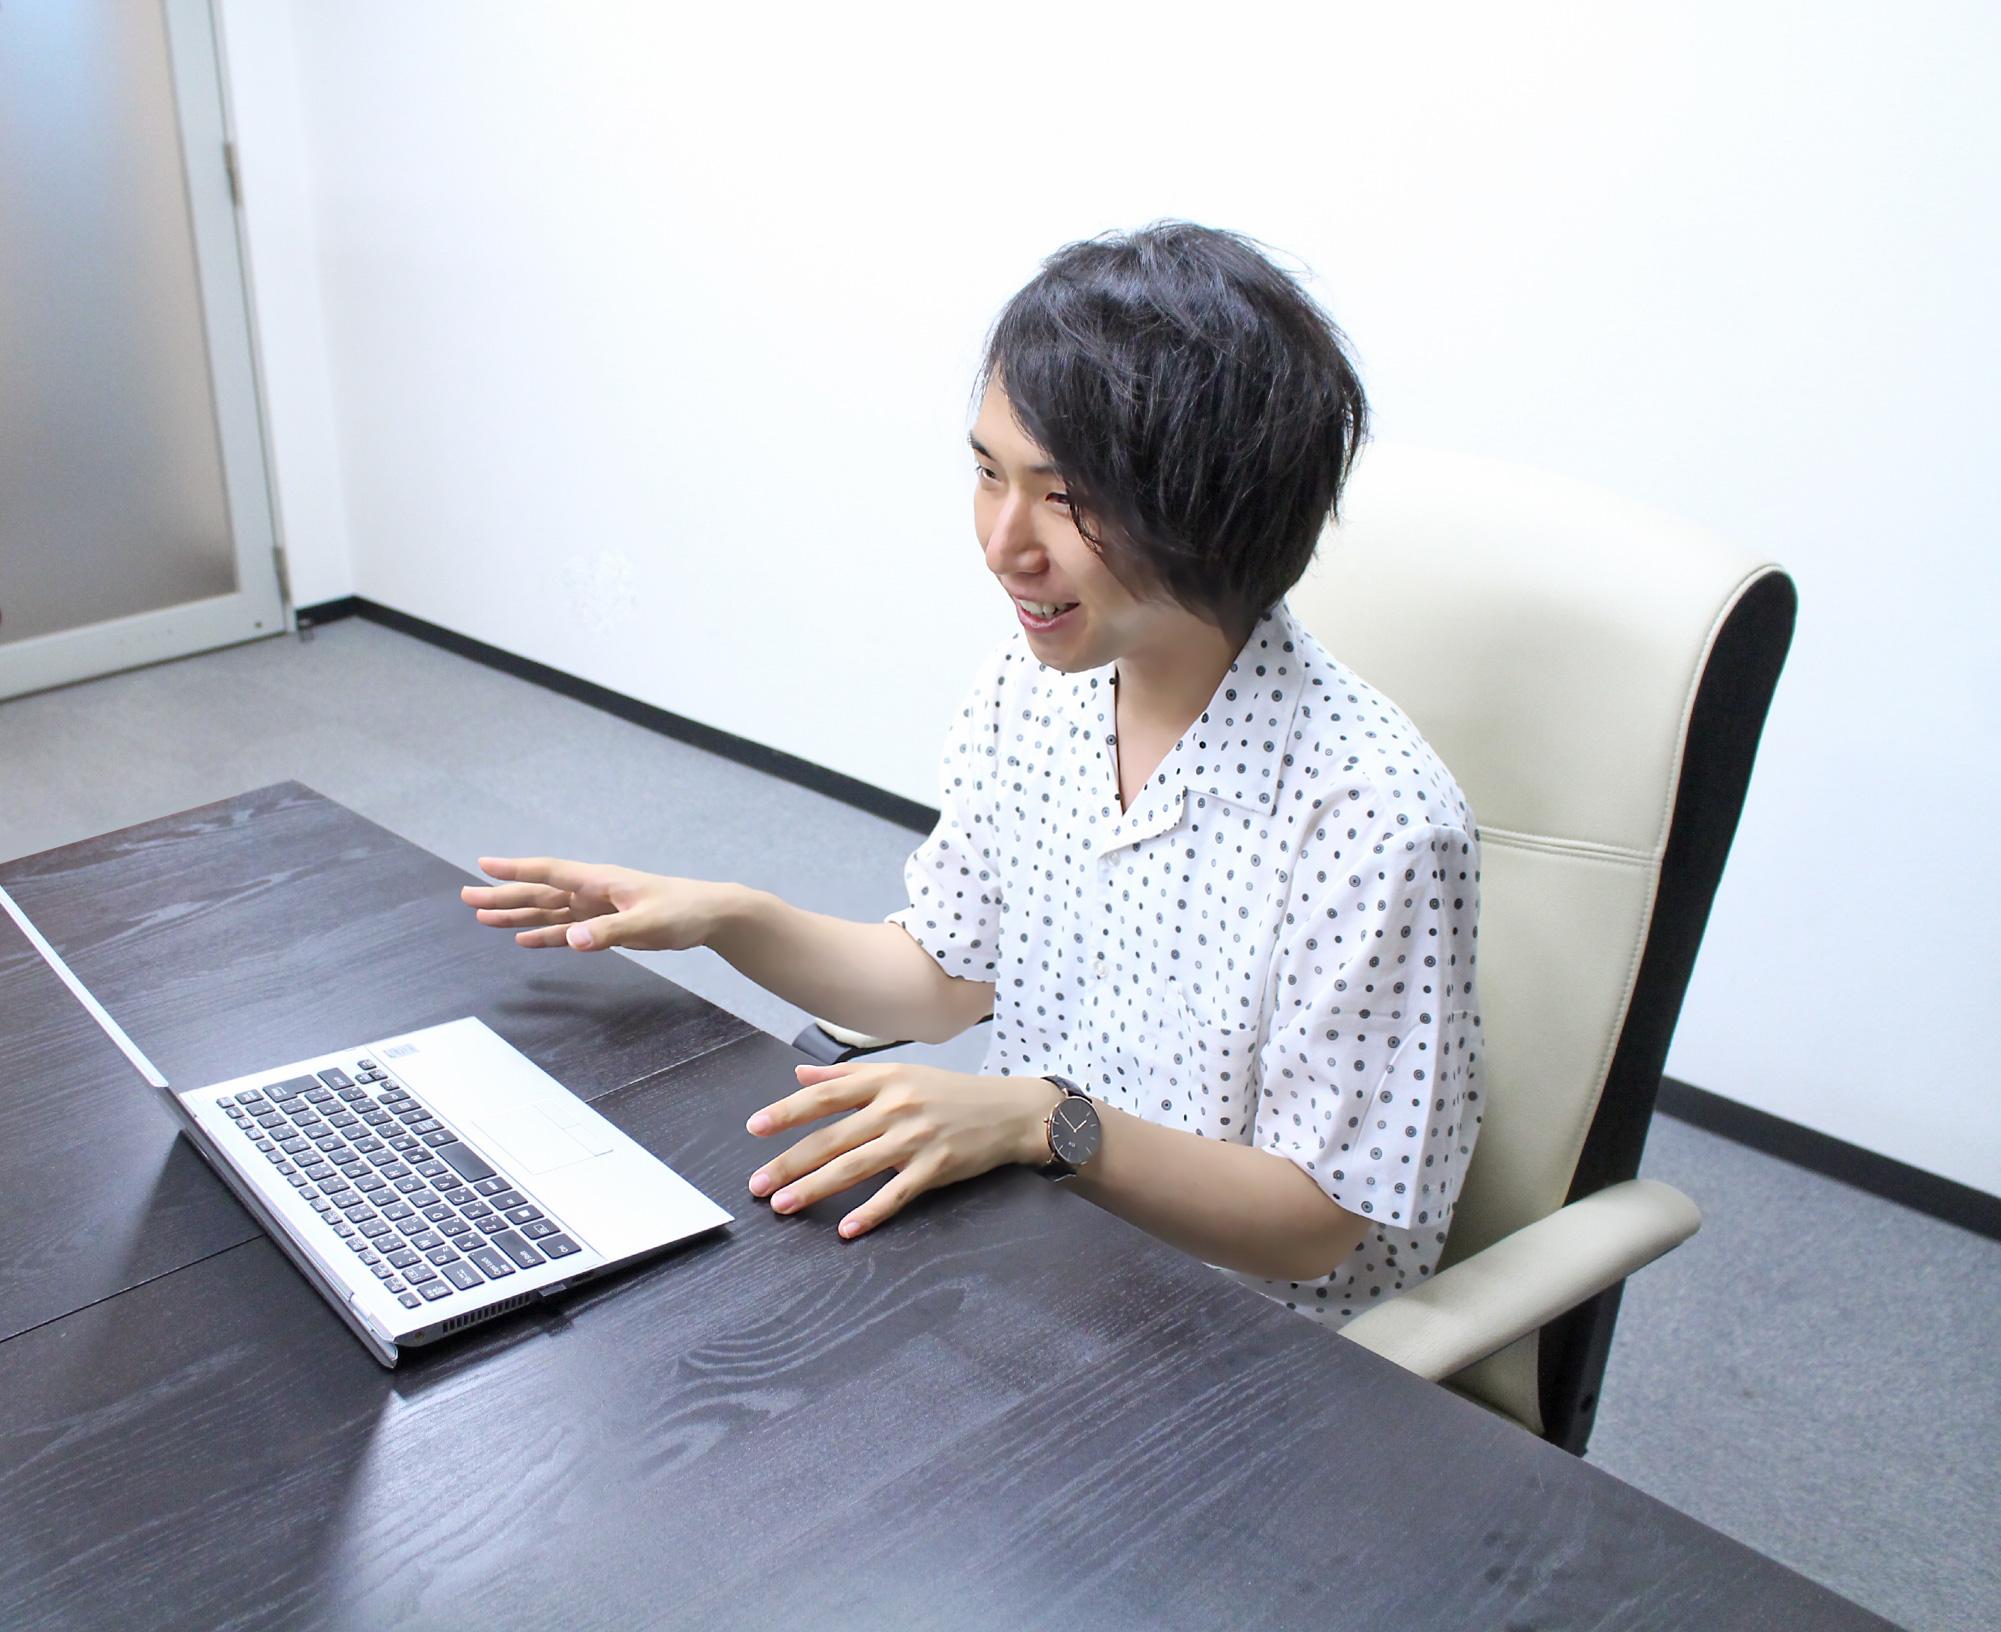 【ZenClerk:クライアント様インタビュー】Pierrot 有限会社セレクト 事業副統括 山ノ内様